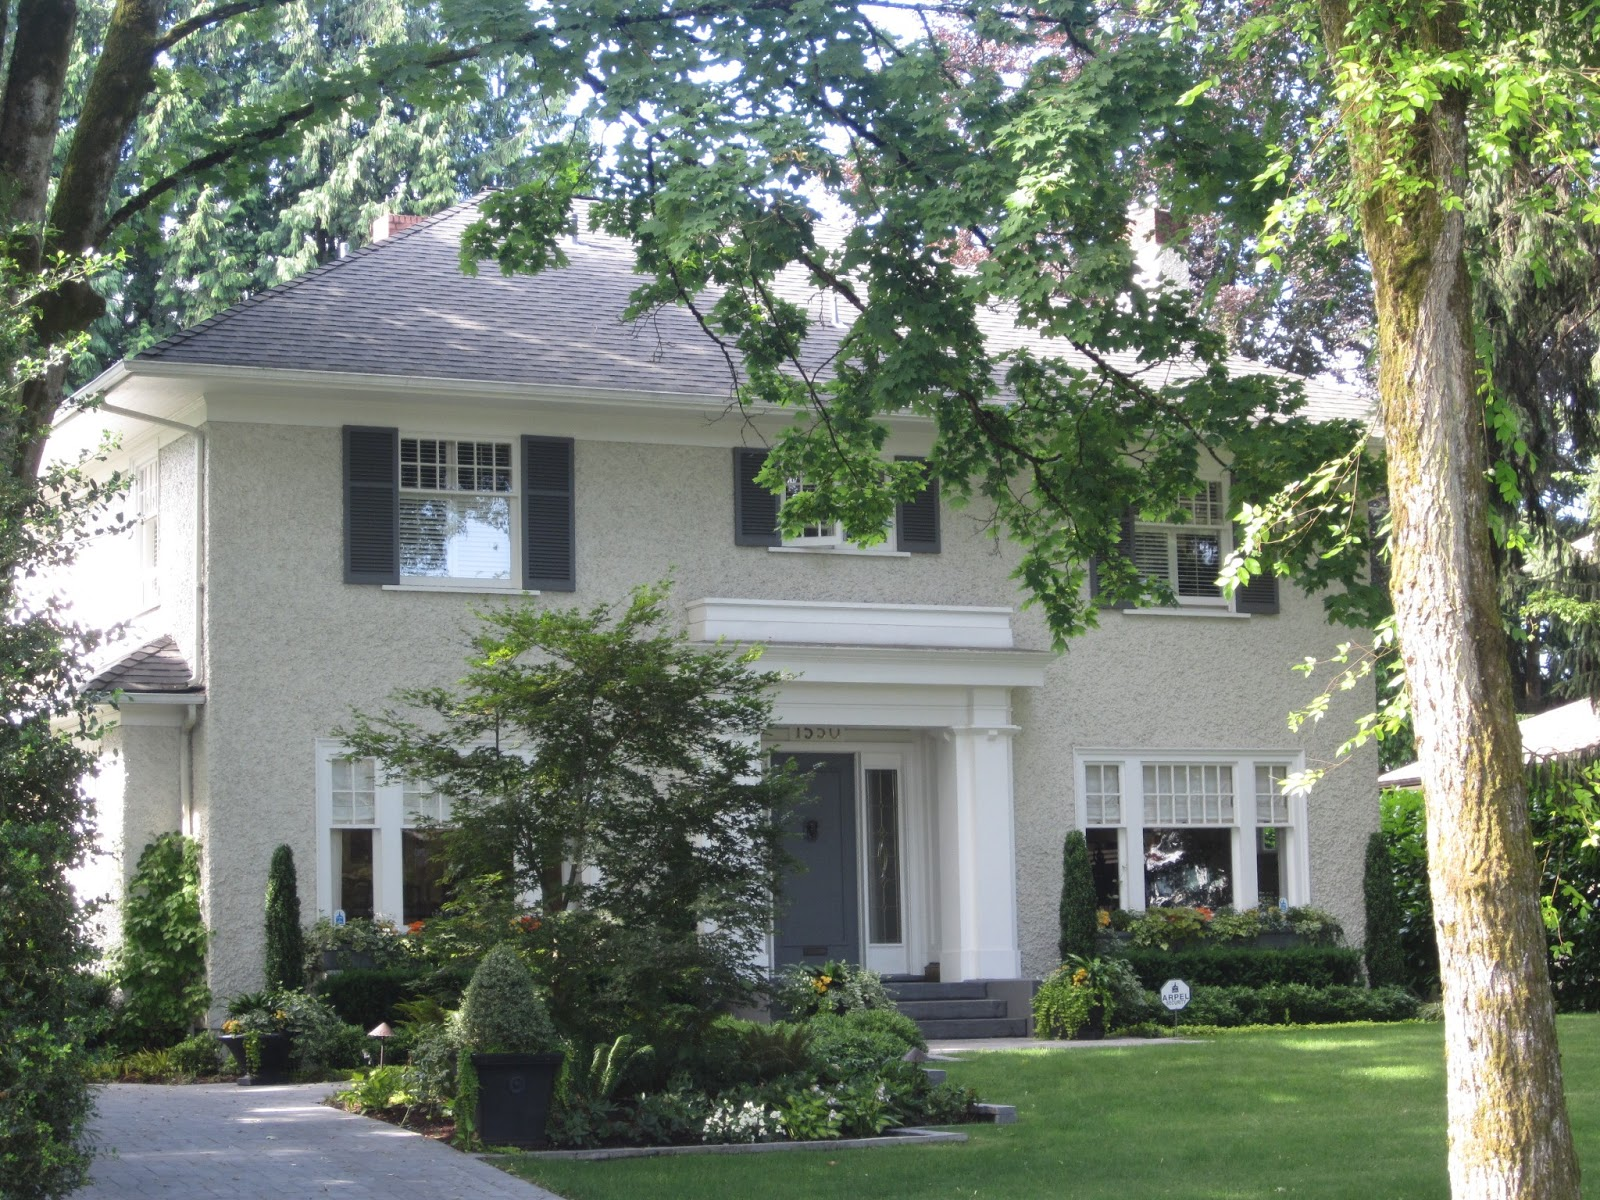 haus design eye on vancouver beautiful homes. Black Bedroom Furniture Sets. Home Design Ideas